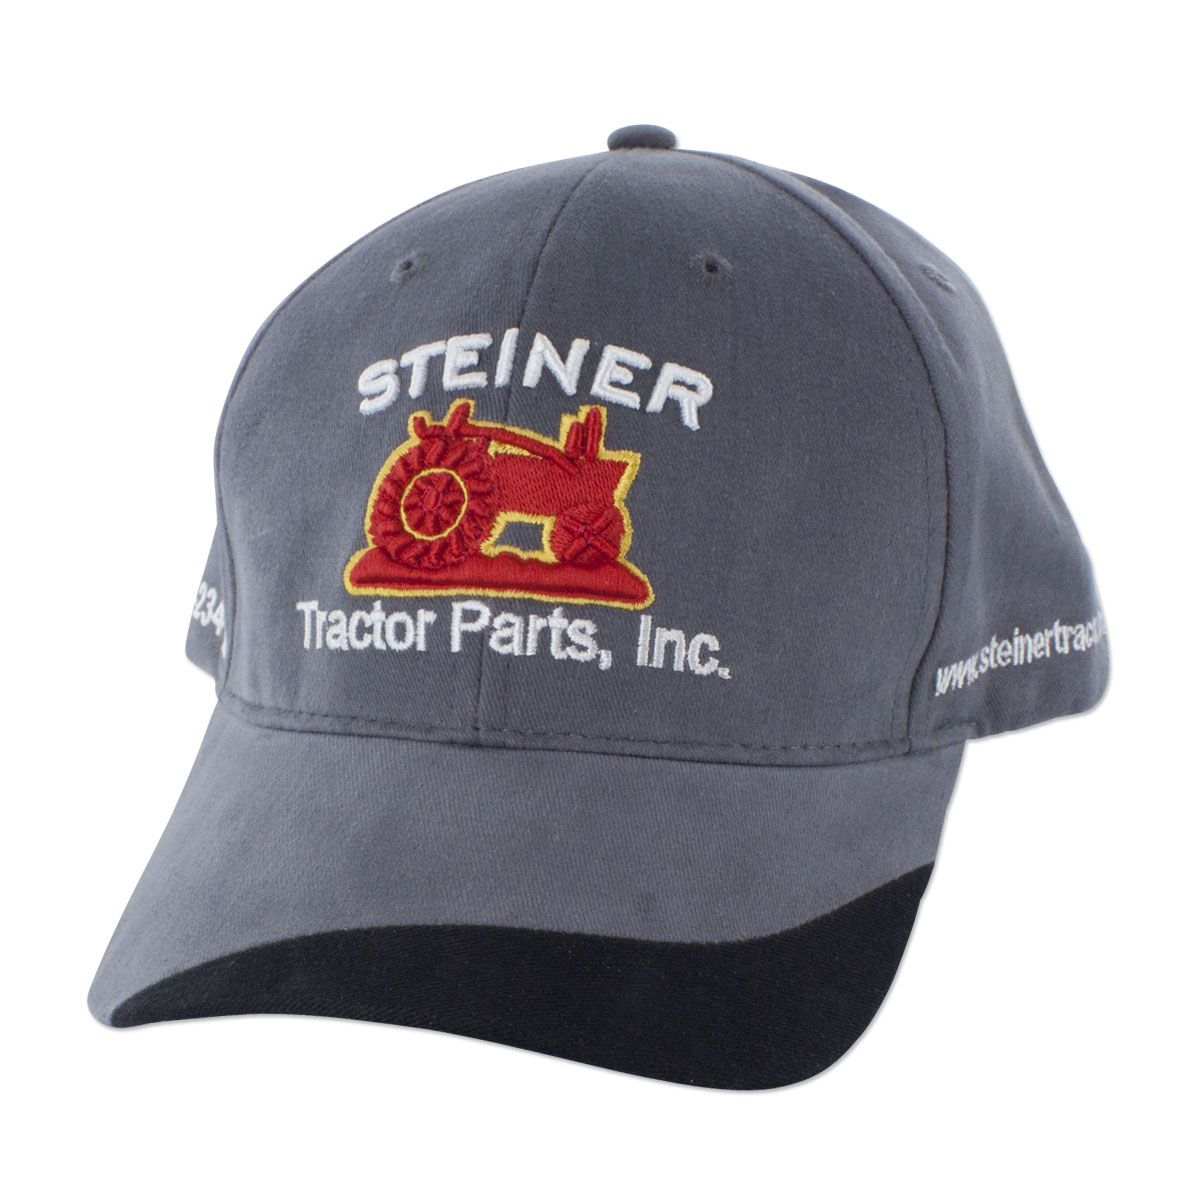 7d12d7b8 Grey Fabric Steiner Tractor Parts Hat | Tractor Collector Hat | Tractor  Restoration Hat | H12